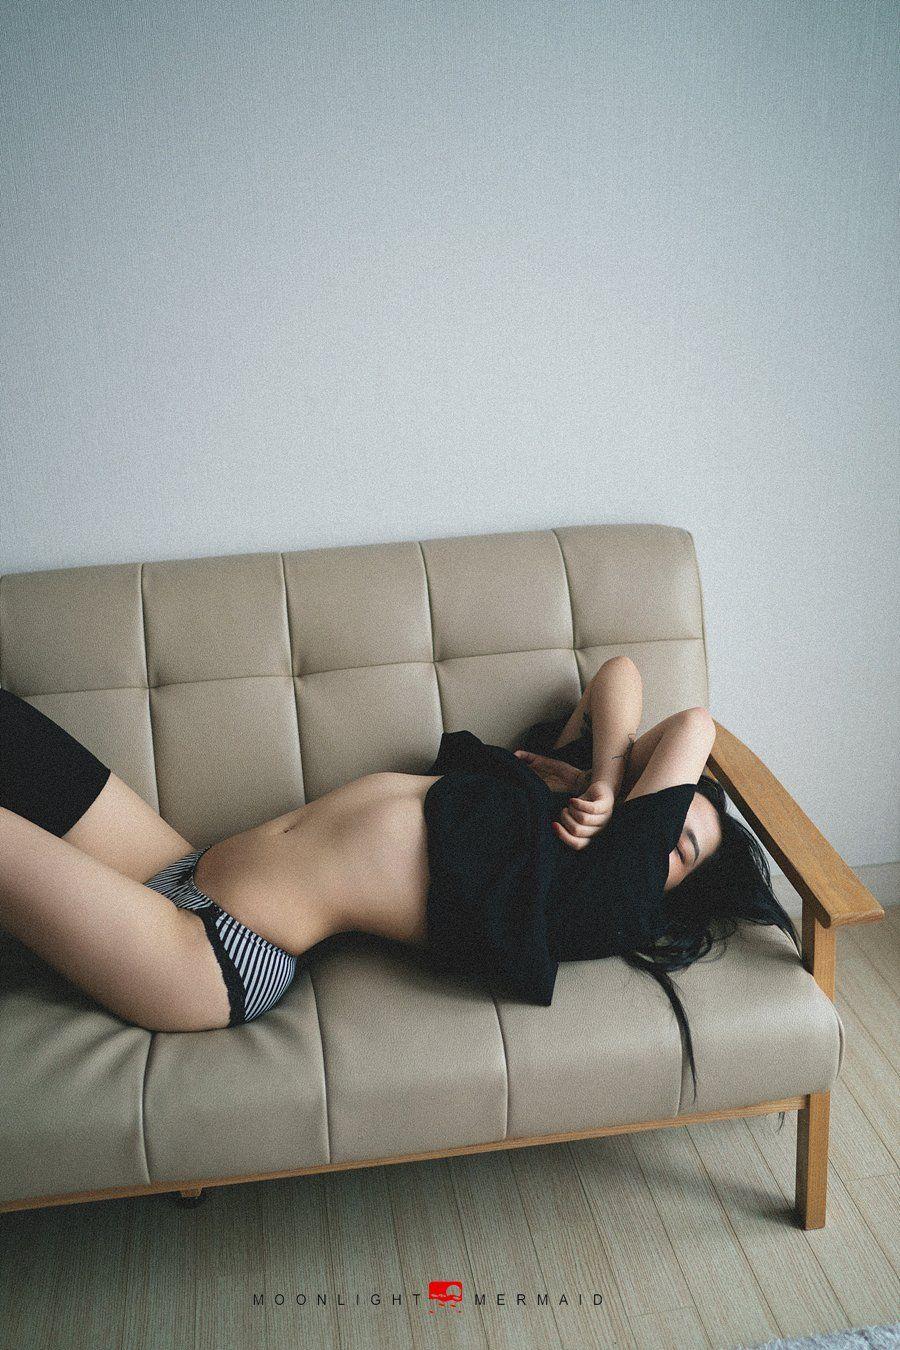 #sexy #girl #woman #beauty #cute #light #night #red #seminude #potrait #underwear #female #cigarette #filmlike, moonlight_mermaid